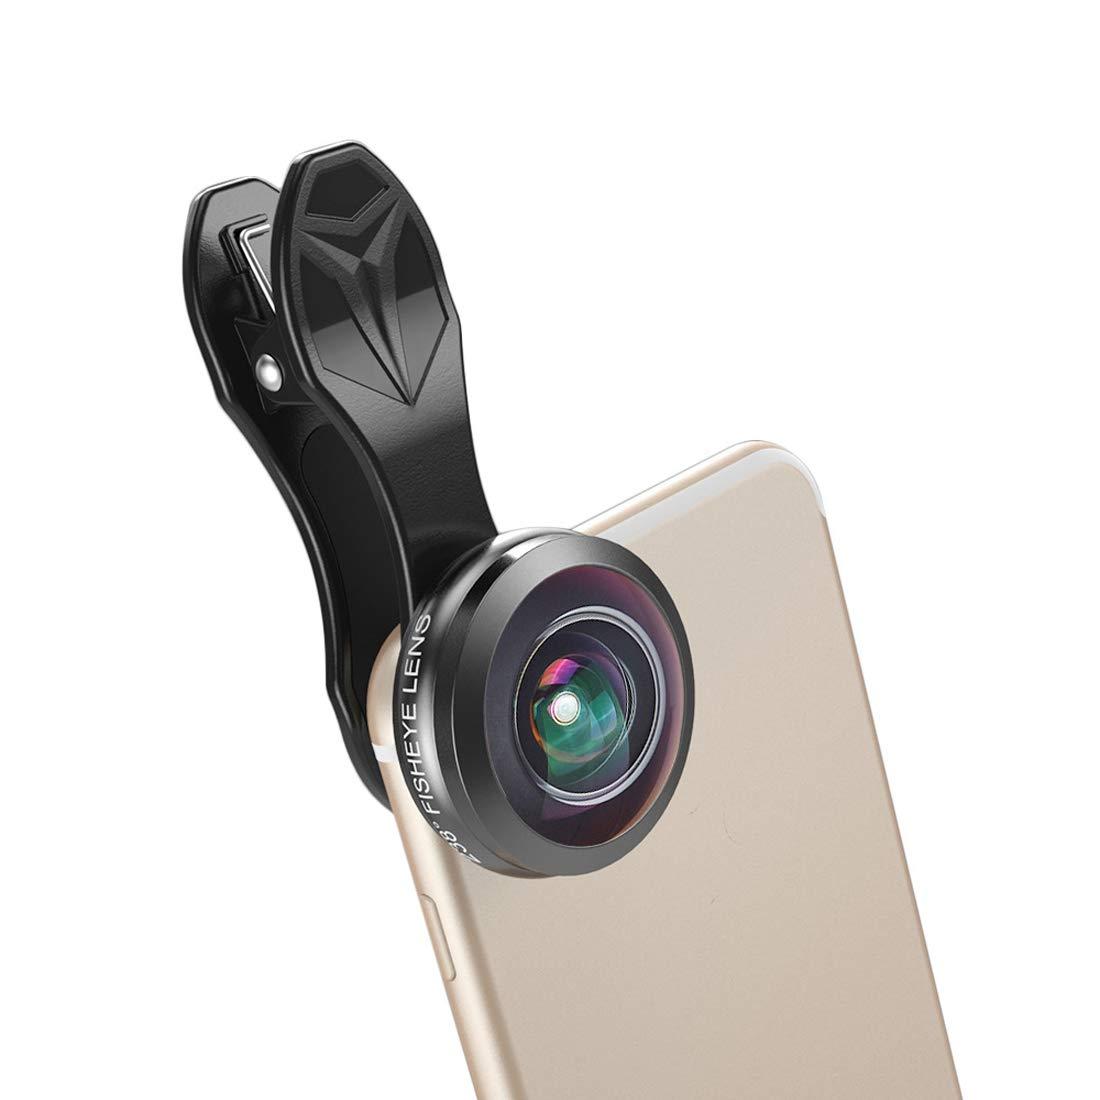 Kathleen Chance Smartphones Phone Camera Lens 230° Super Fisheye Lens HD Optic Glass Lens Compatible iPhone xs/8/7 Samsung Sony LG iPad and Most